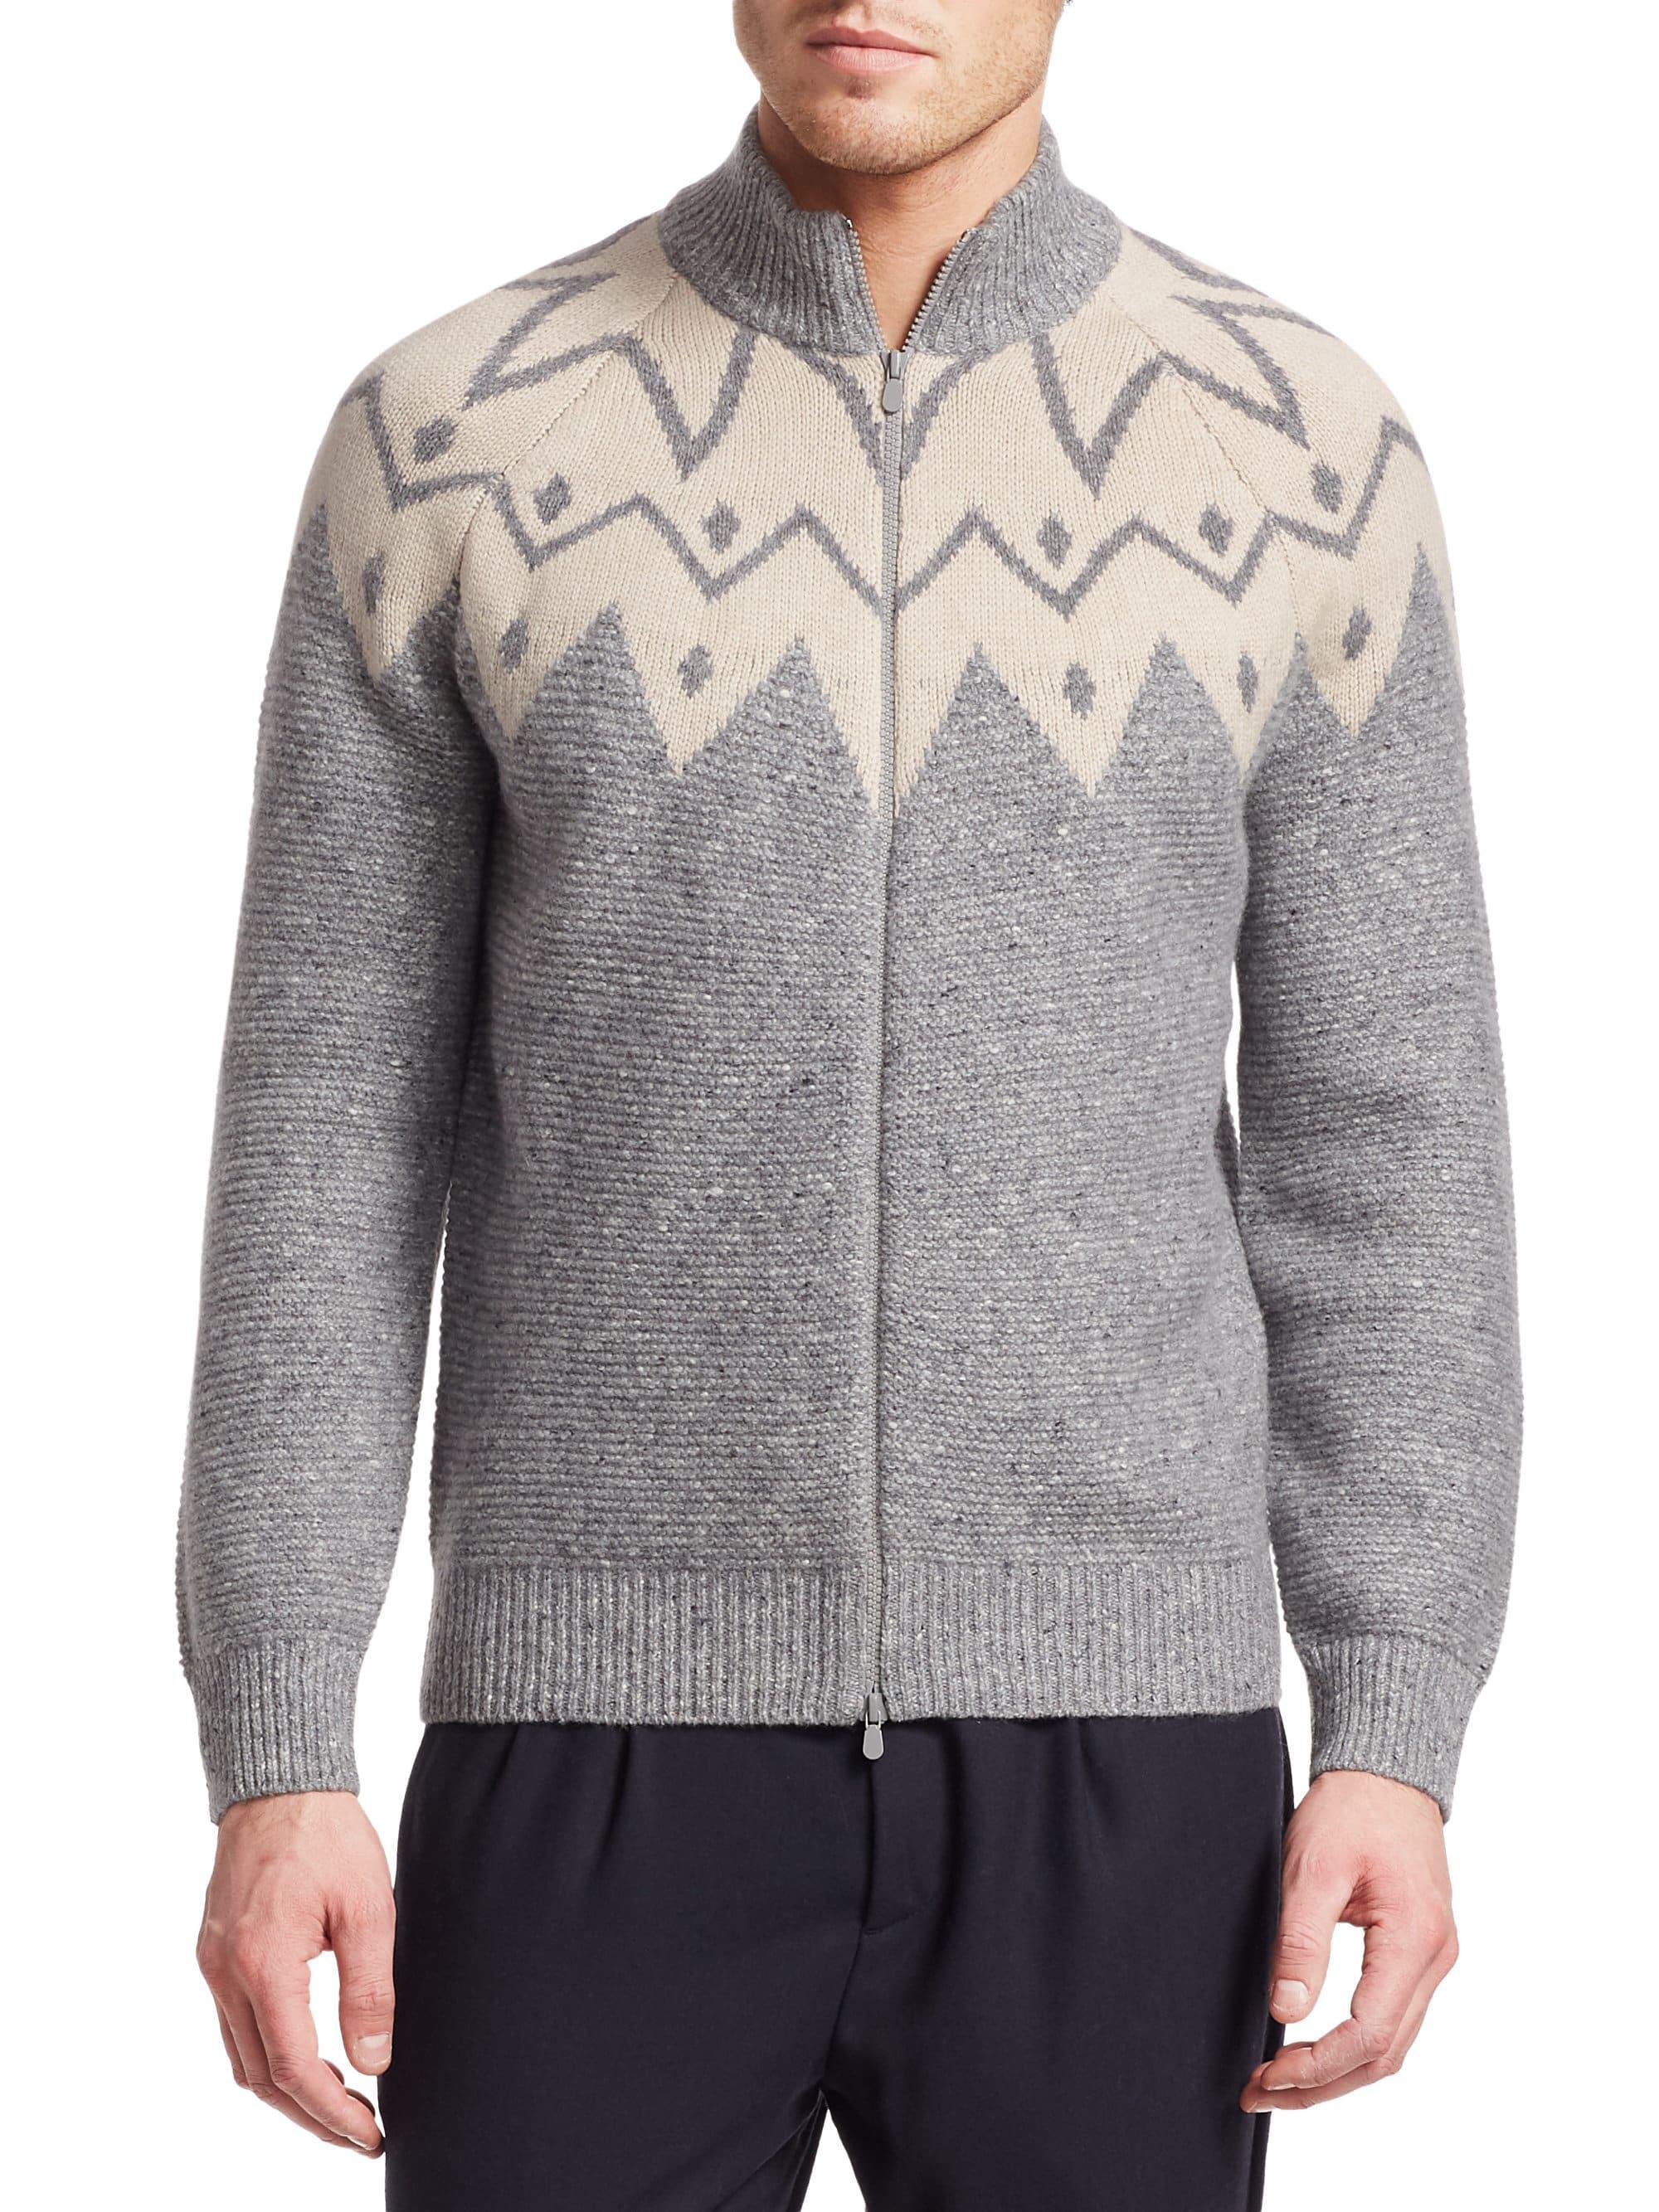 3fcc5d9a8f Lyst - Brunello Cucinelli Jacquard Full-zip Cashmere Sweater in Gray ...